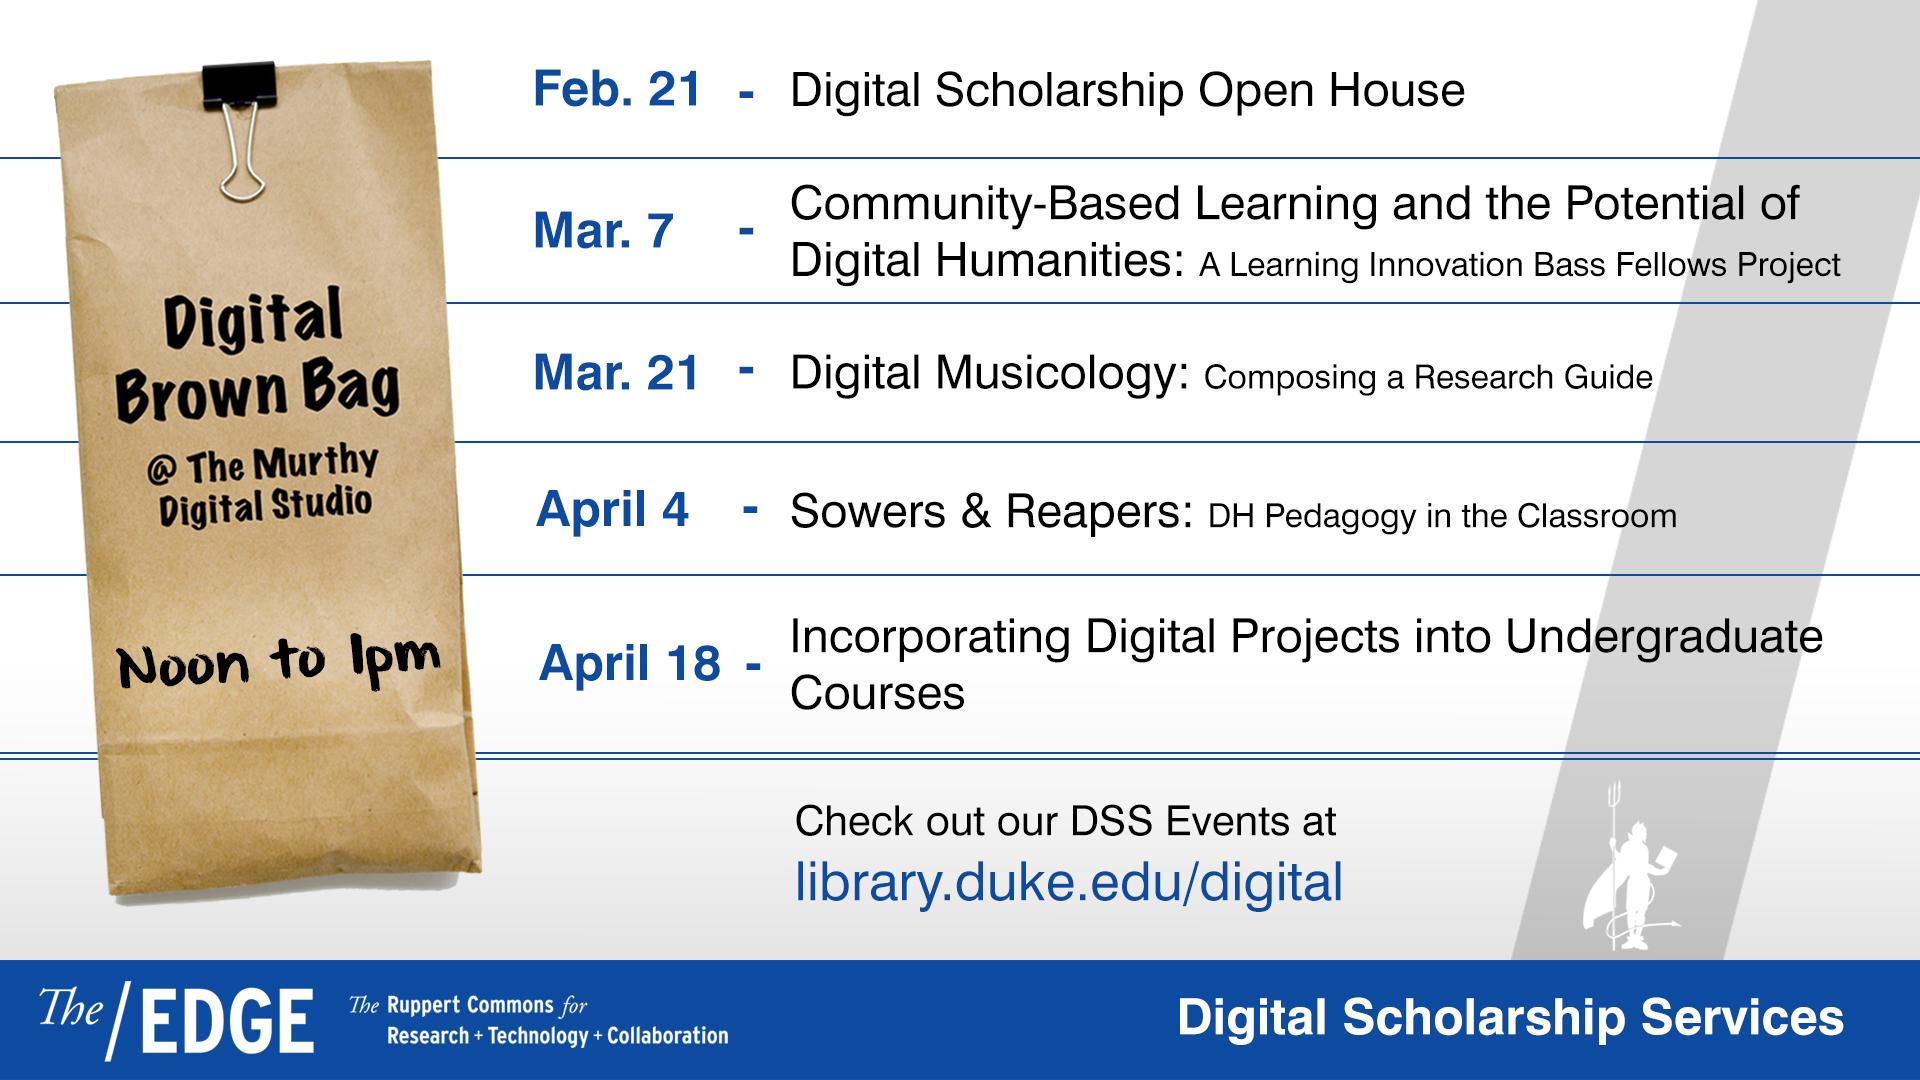 Digital Brown Bag: Digital Musicology: Composing a Research Guide